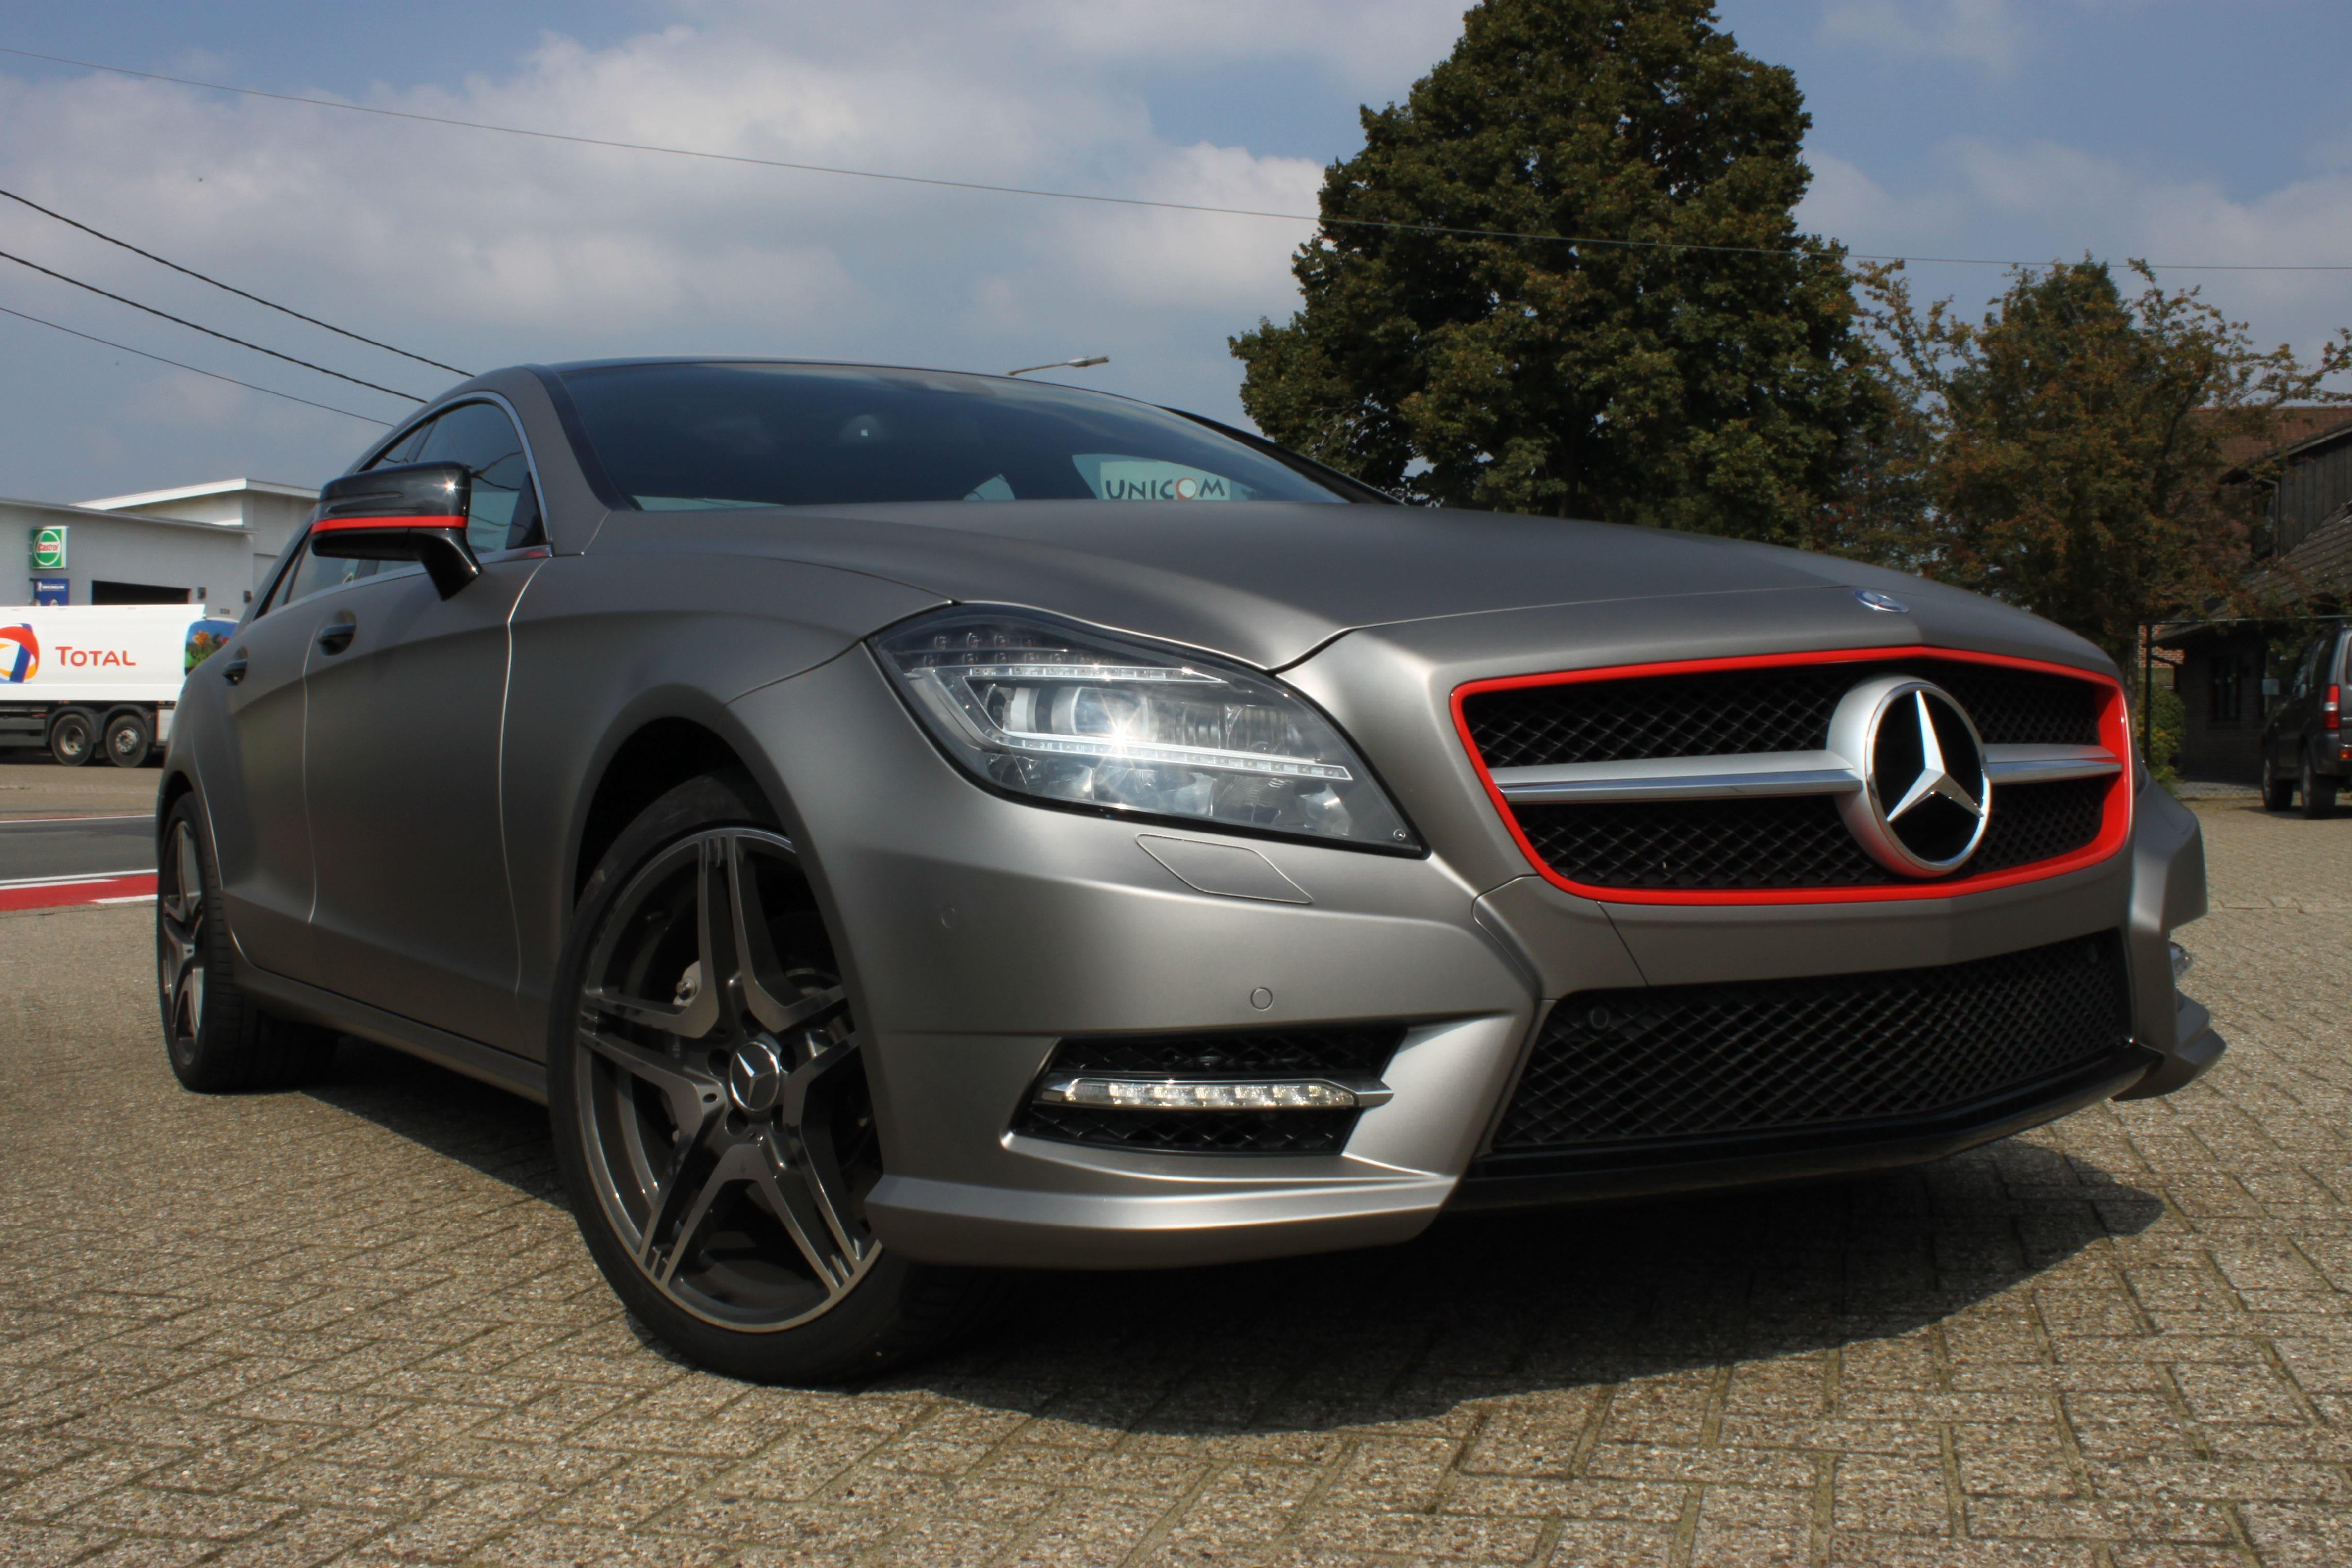 Mercedes CLS met Mat Grey Aluminium Wrap, Carwrapping door Wrapmyride.nu Foto-nr:6164, ©2020